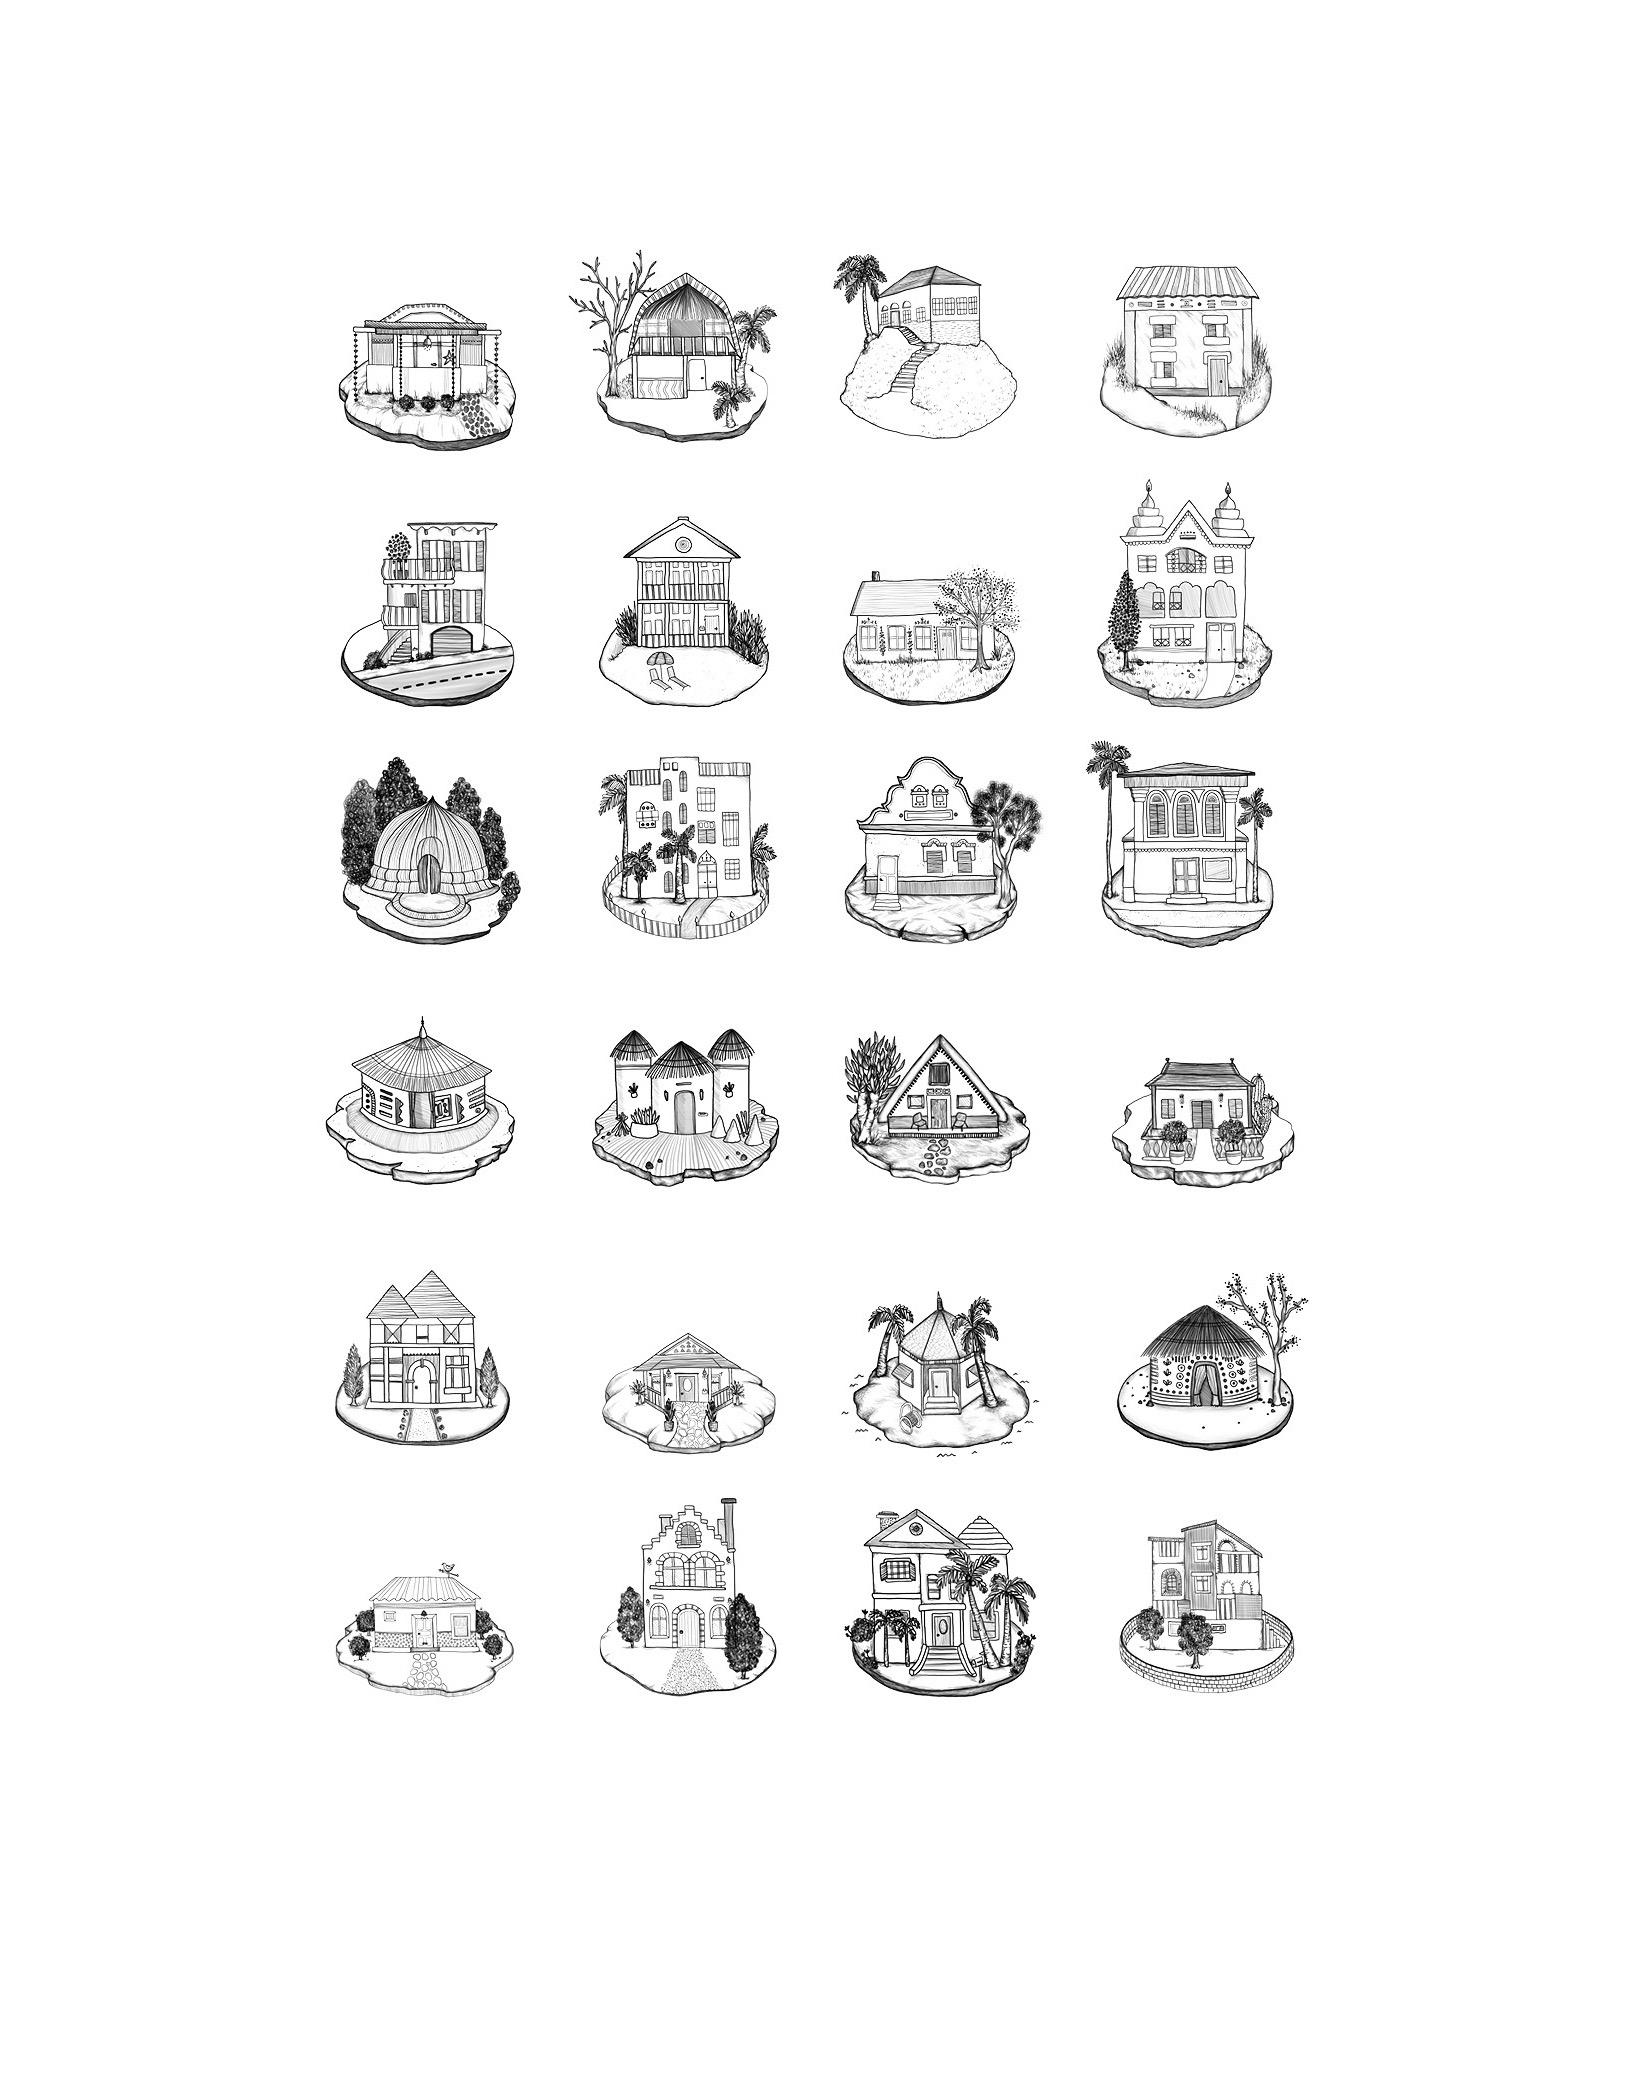 portfolio-emilyroseartist-1010 3.jpg